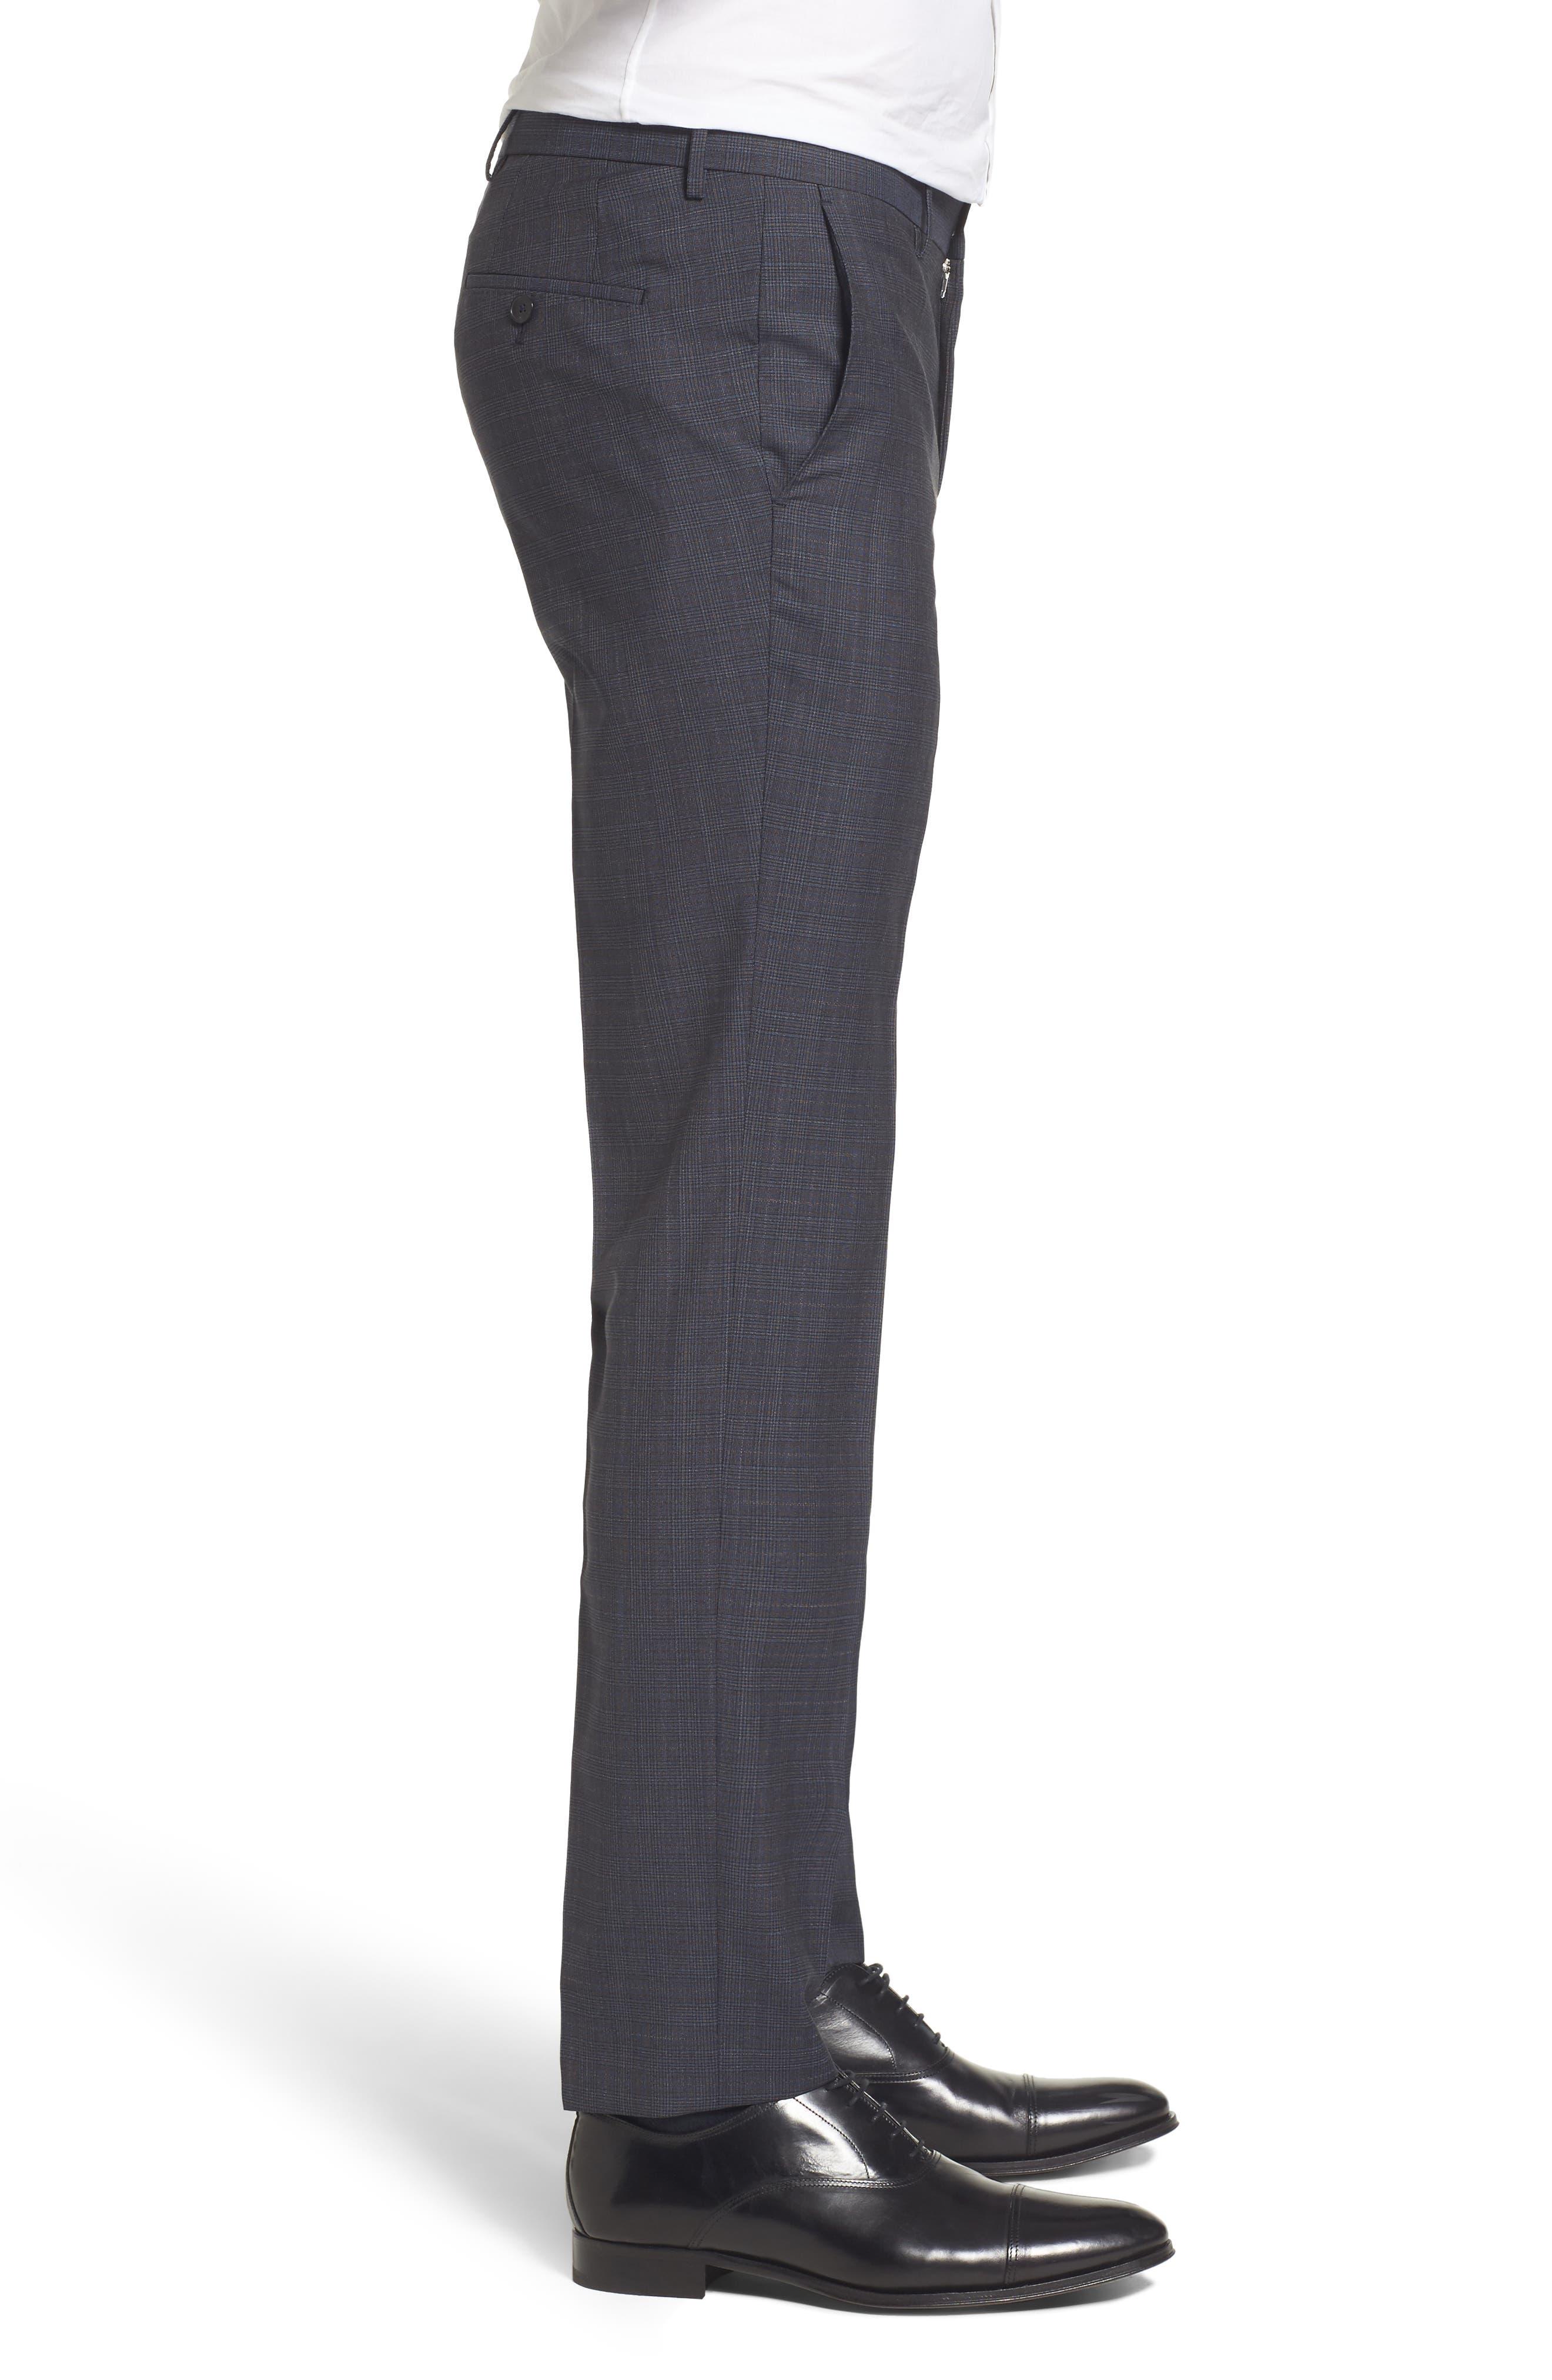 Benso Regular Fit Trousers,                             Alternate thumbnail 4, color,                             410